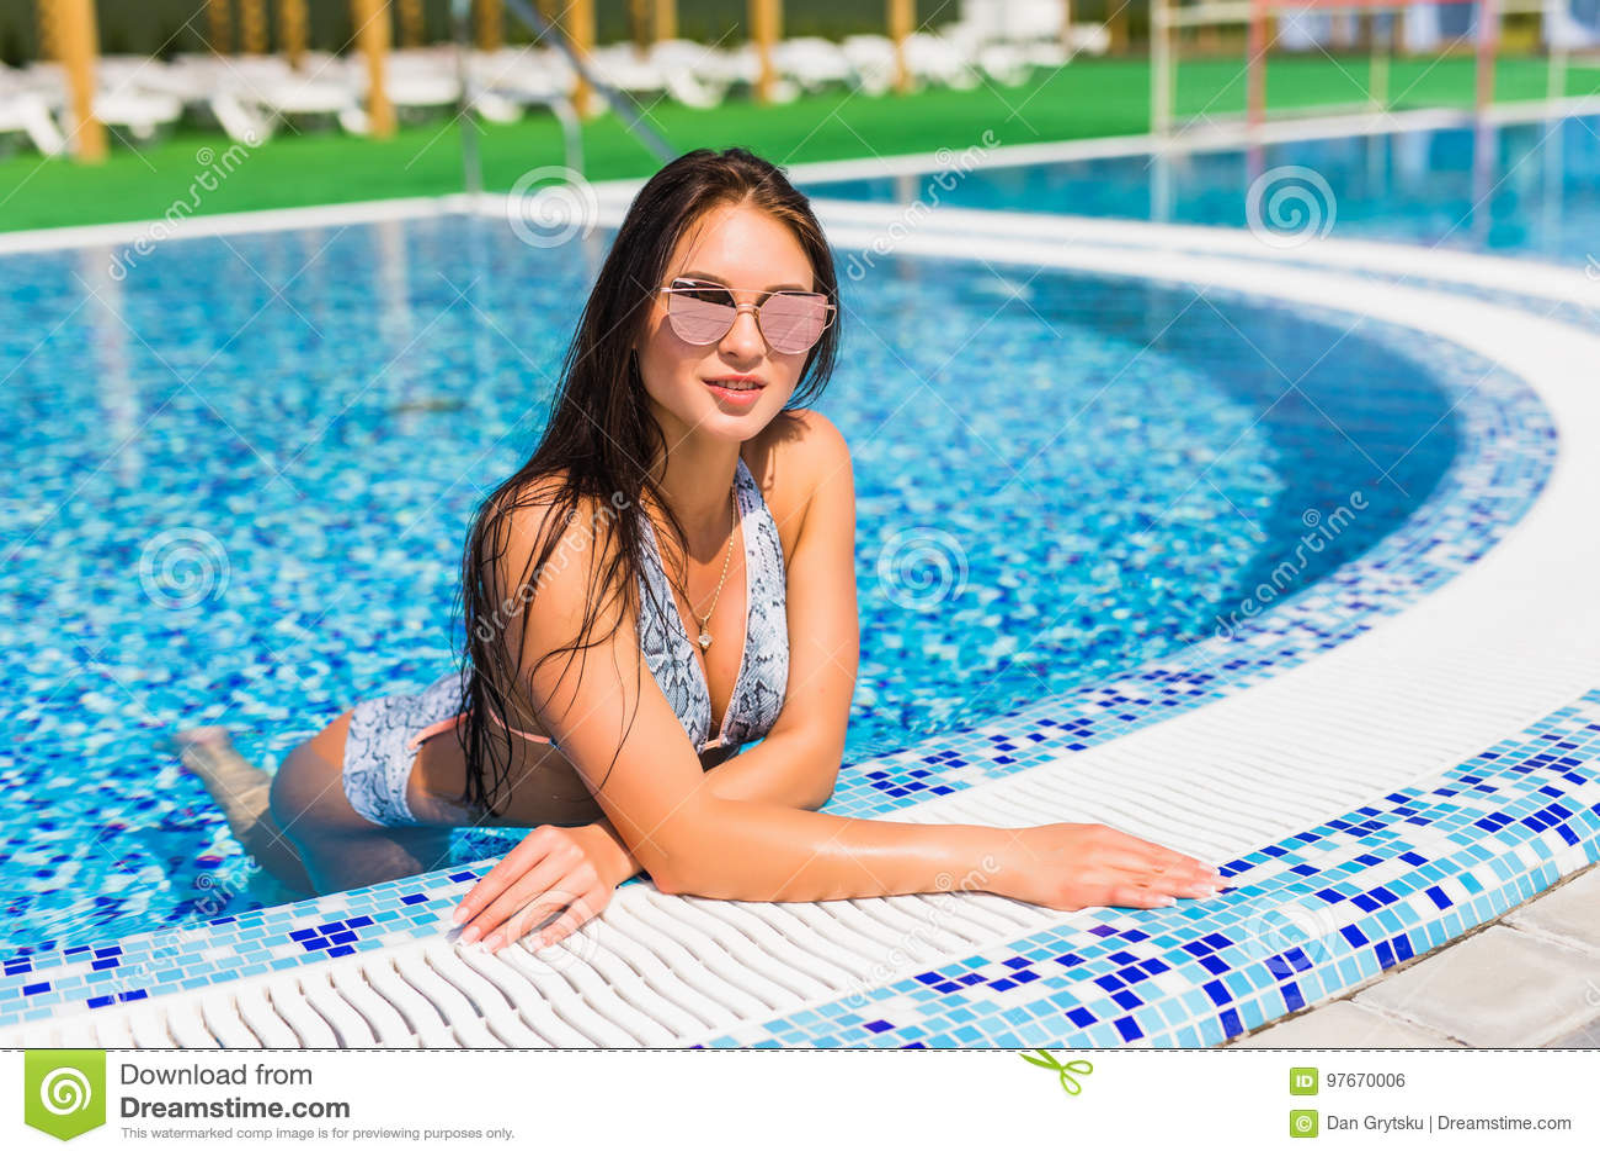 cfbb3d506 woman with perfect curvy body shape in fashionable bikini swimwear relaxing  at swimming pool edge. . Beautiful Girl With Tanned Skin